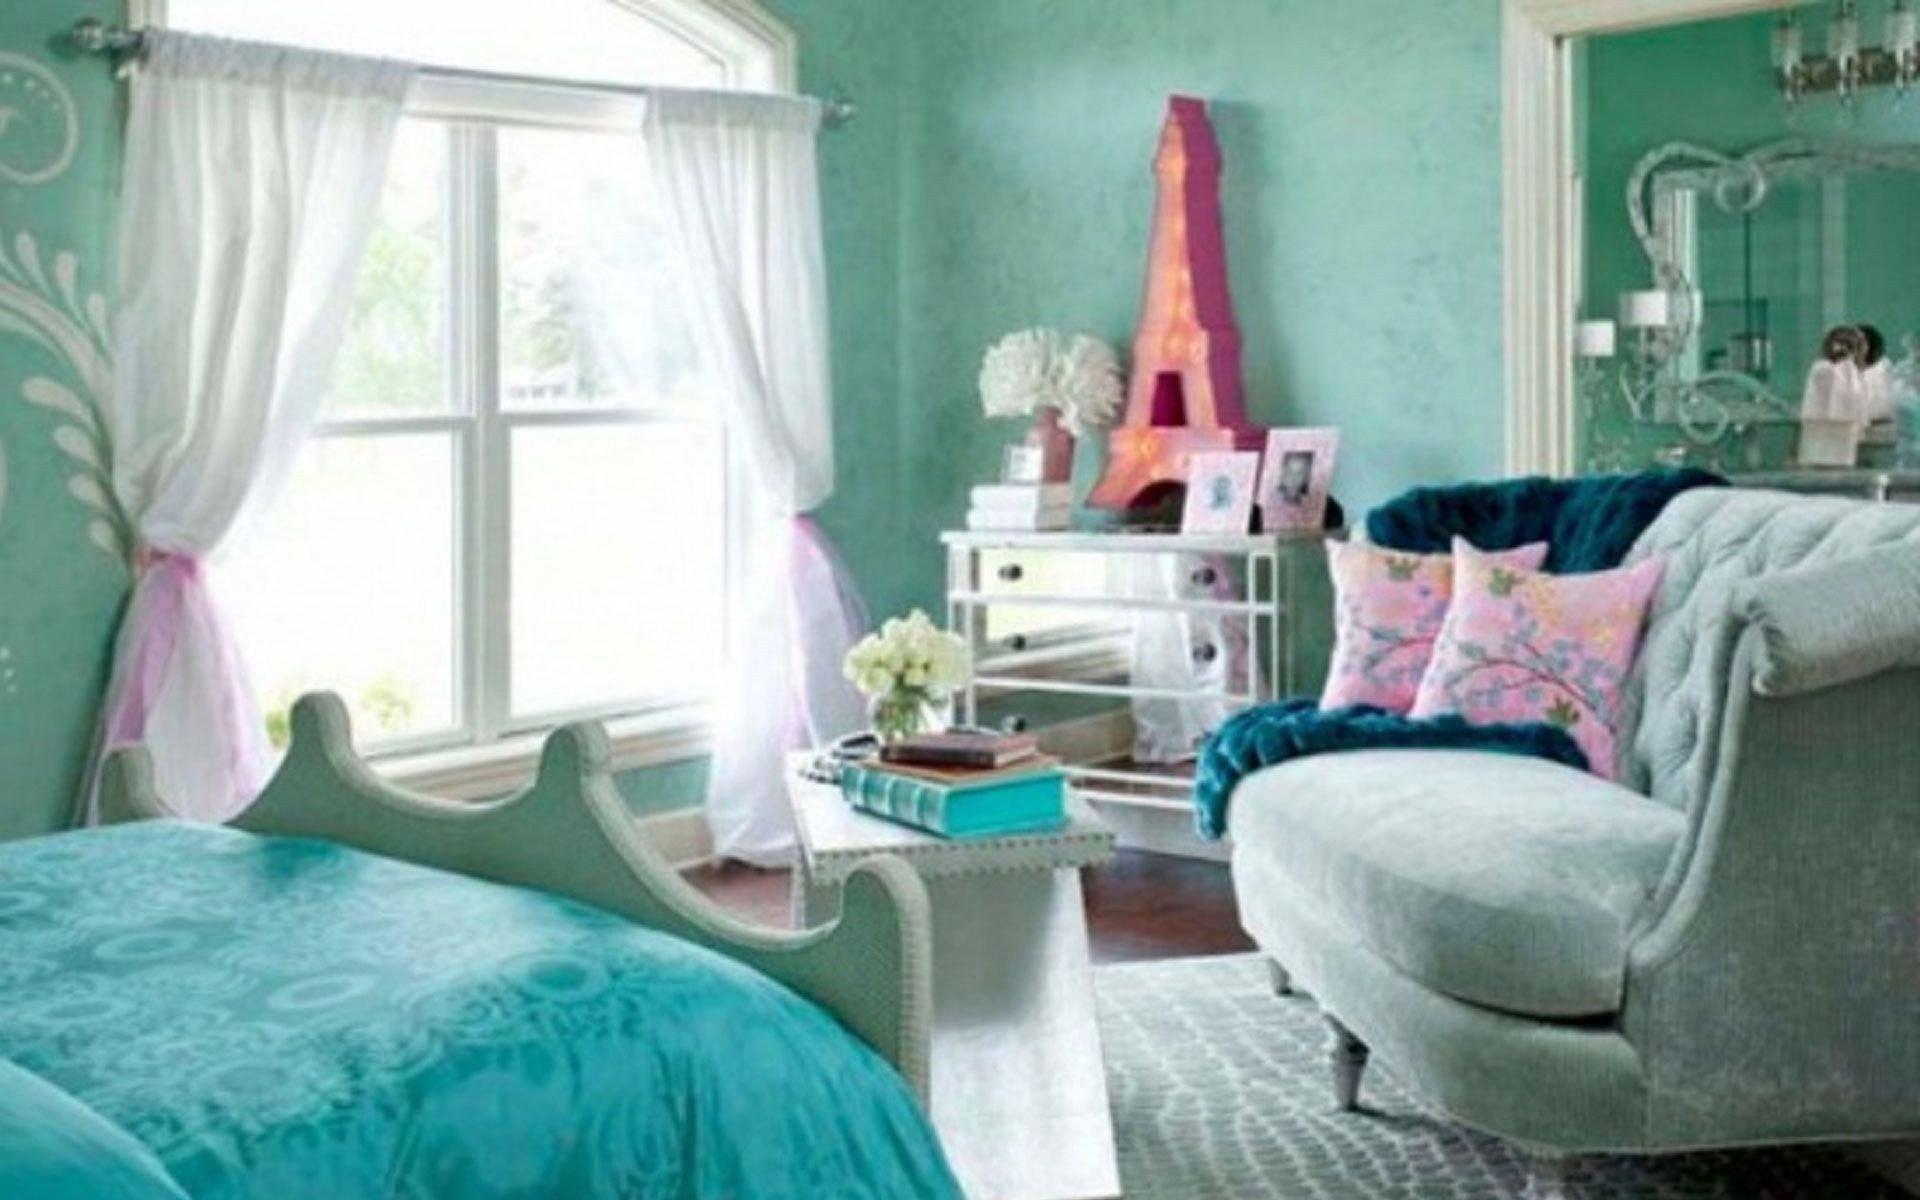 Teal and Black Bedroom Ideas Beautiful Girl Bedroom Bold Girls Room Things for Girls Room Girl39s